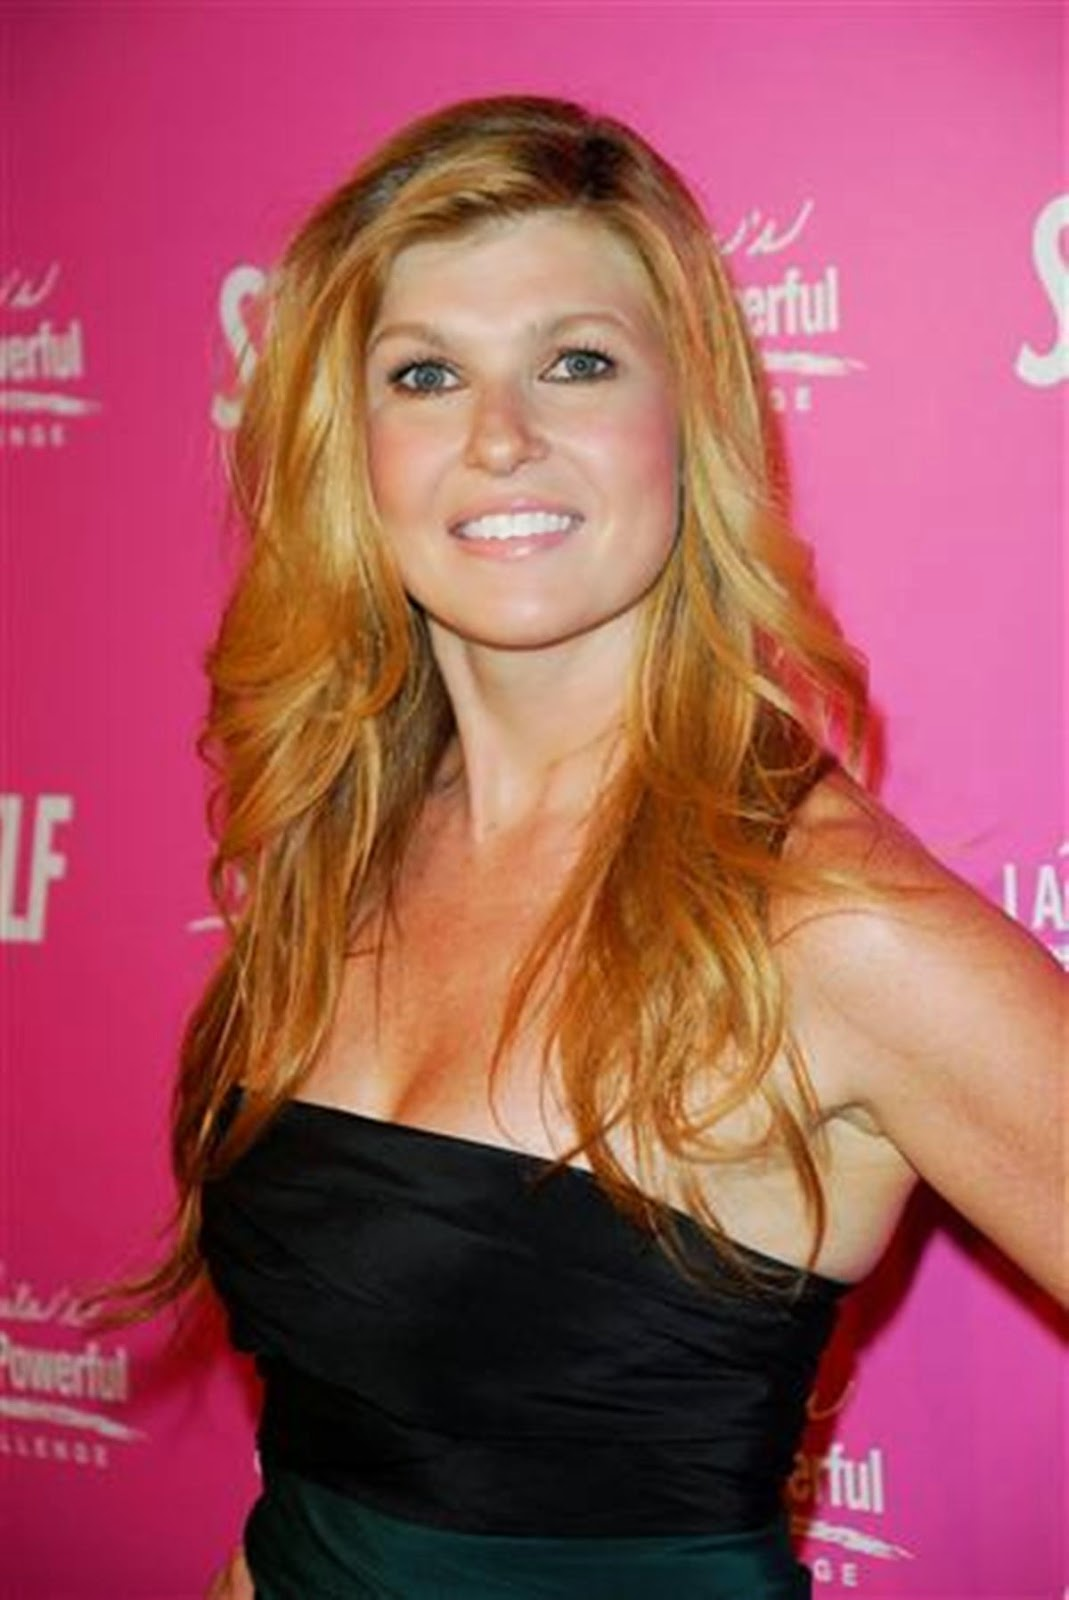 Kimberley Simms,Jeannie Russell Sex video Virginia Leith,40. Vanessa Hudgens